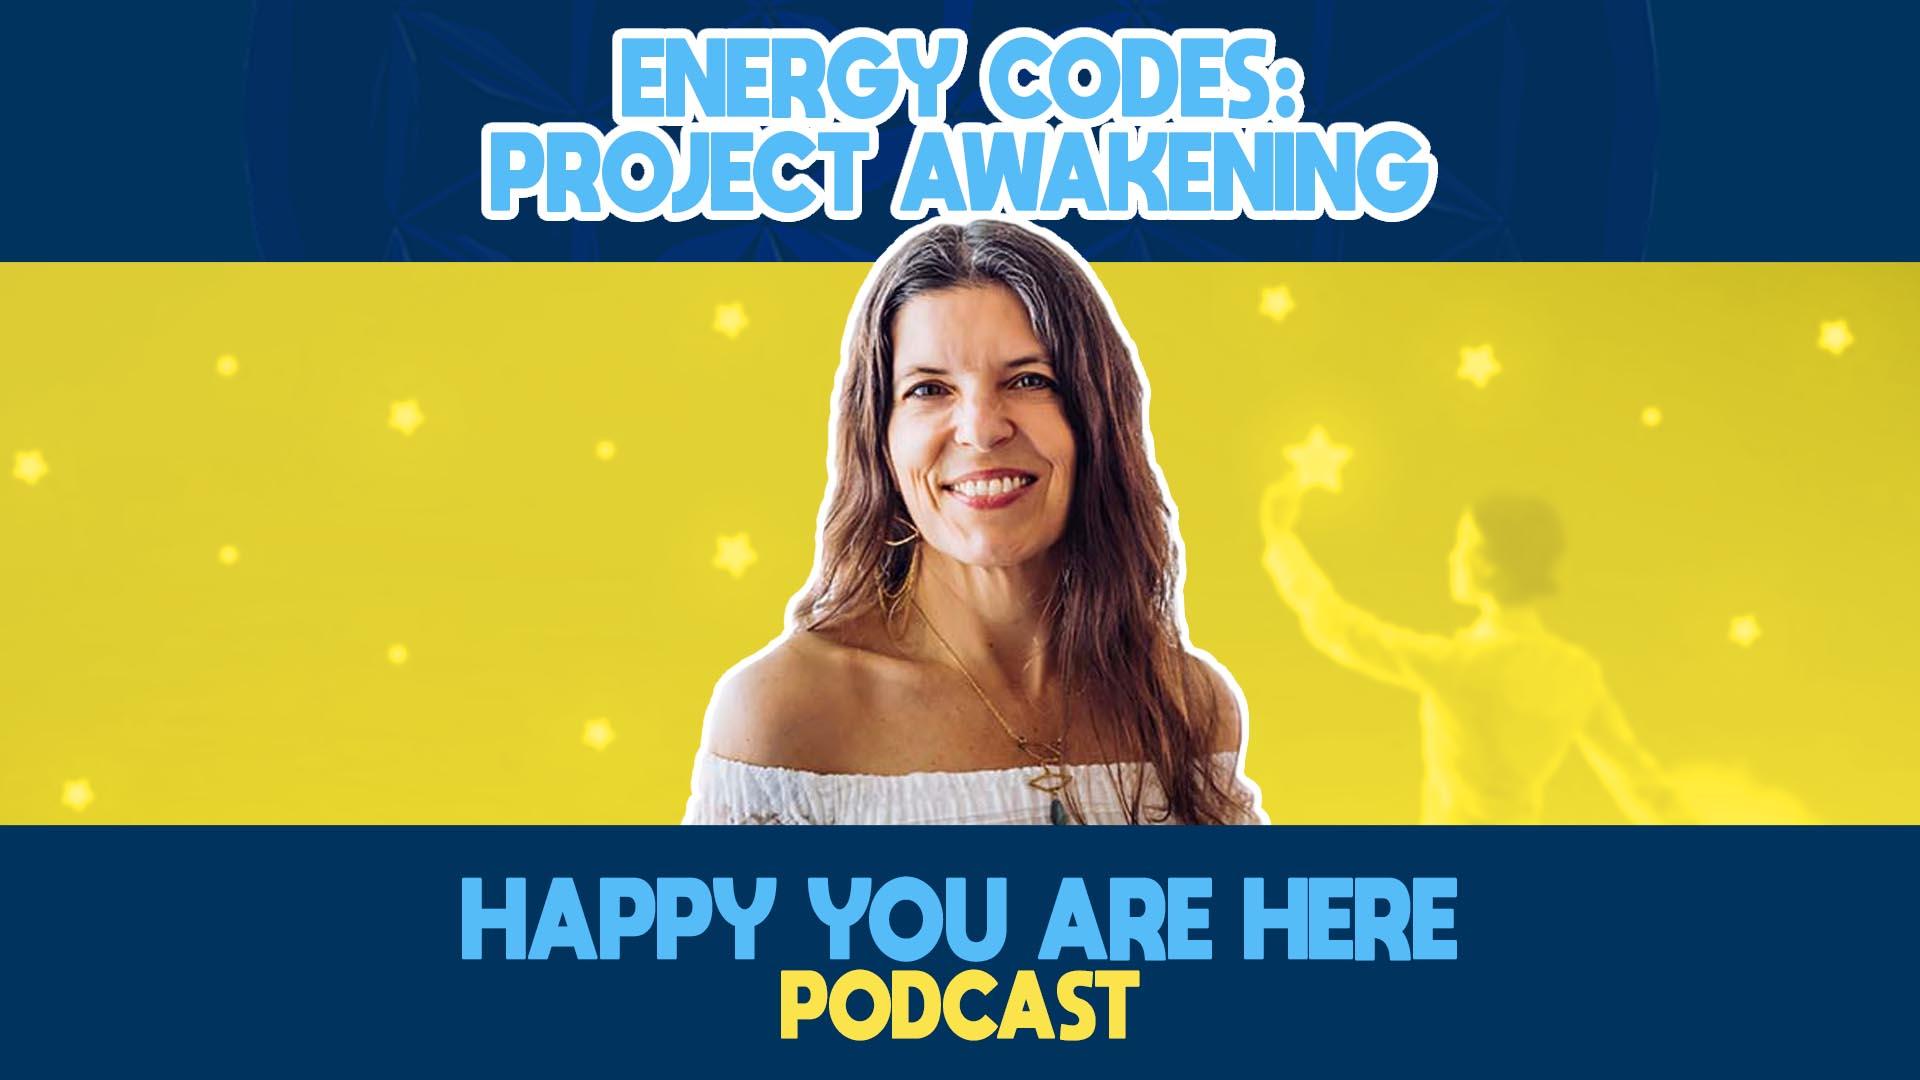 Energy Codes Project Awakening Course